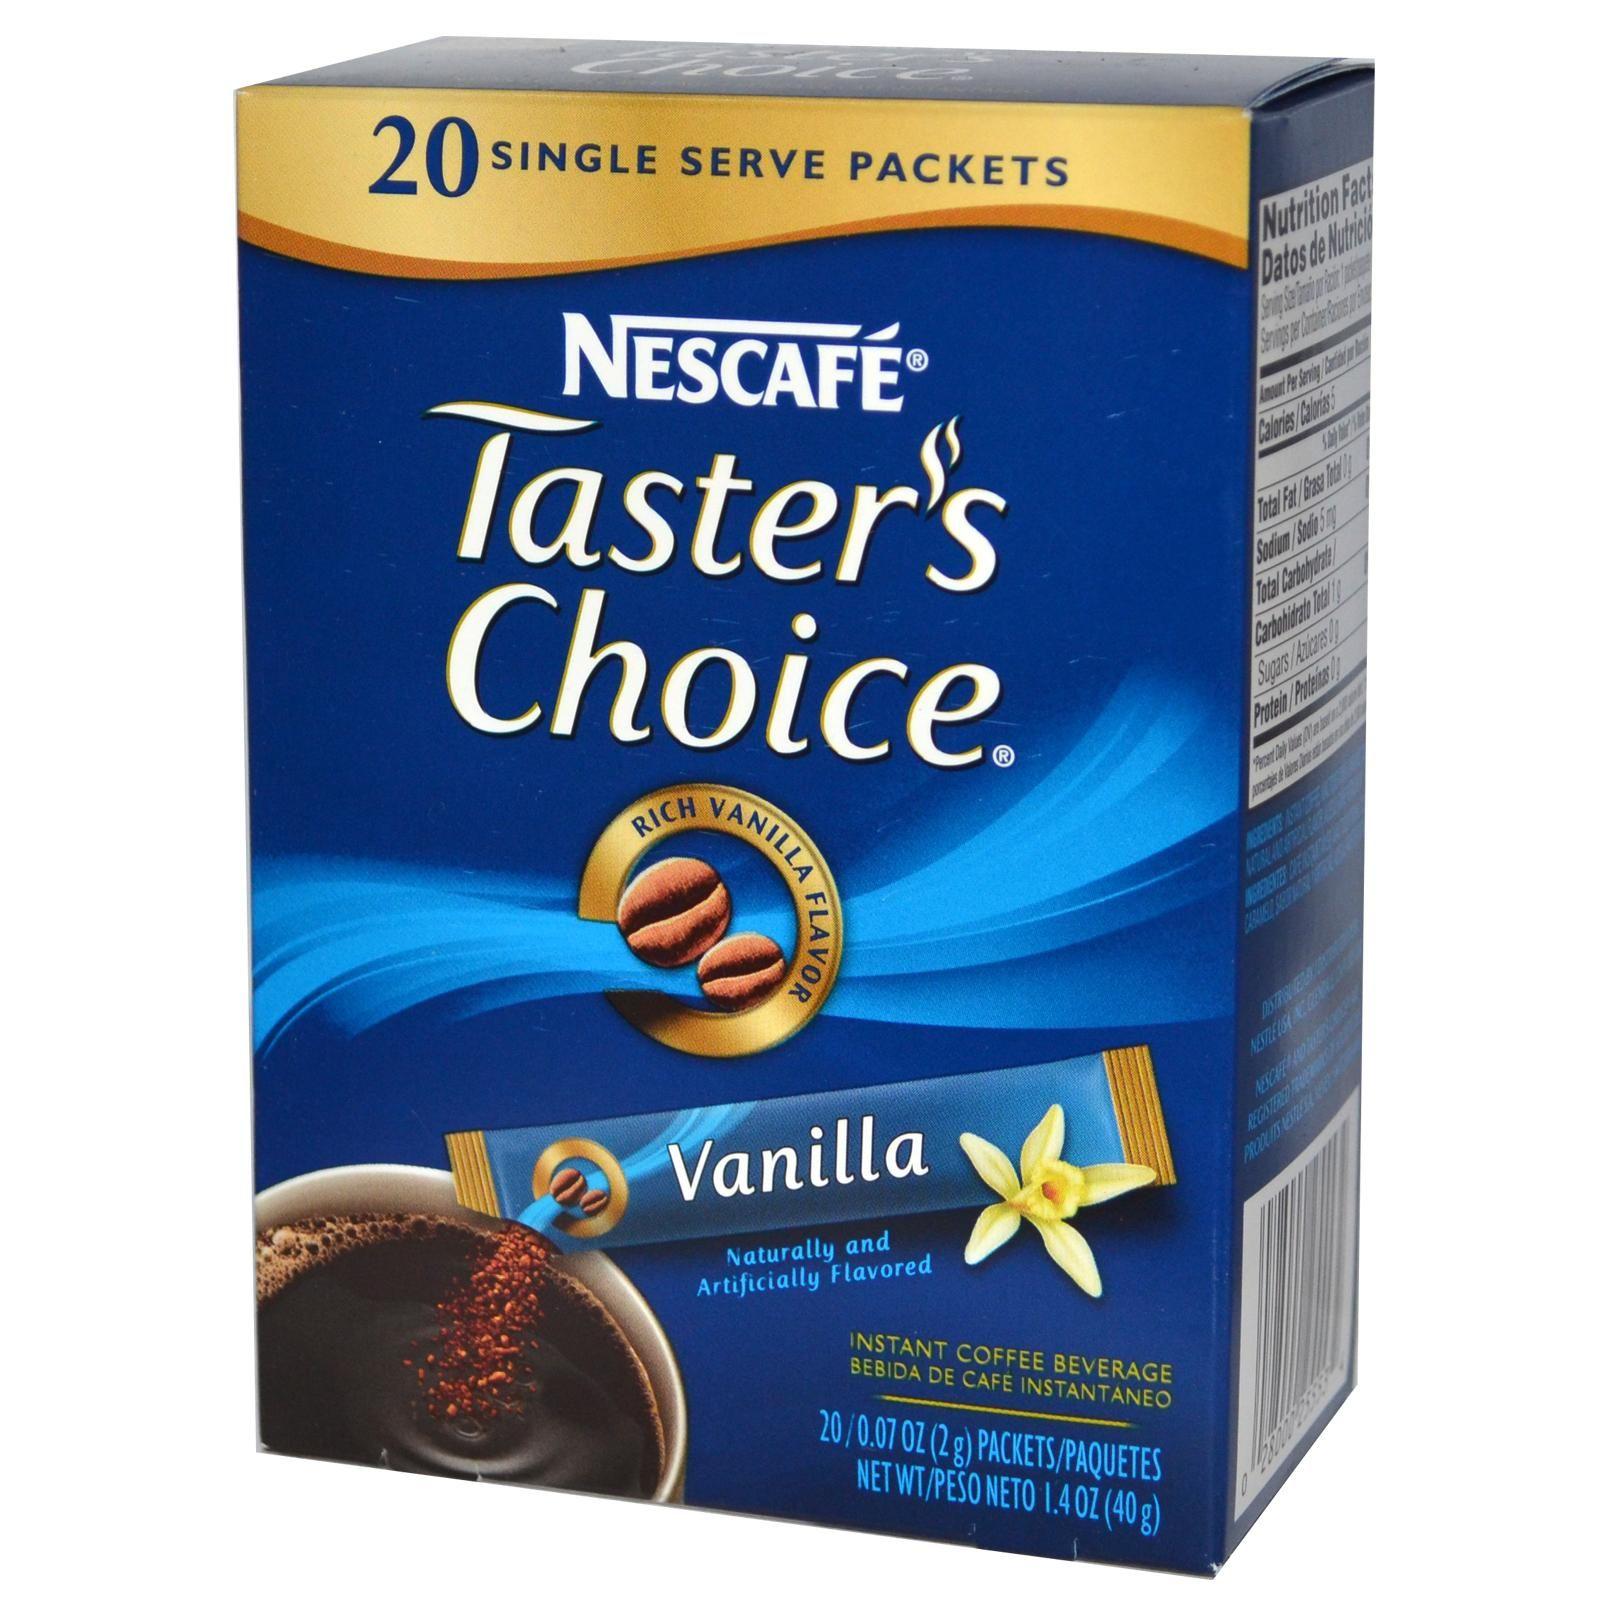 Nescafé, Taster's Choice, Instant Coffee Beverage, Vanilla